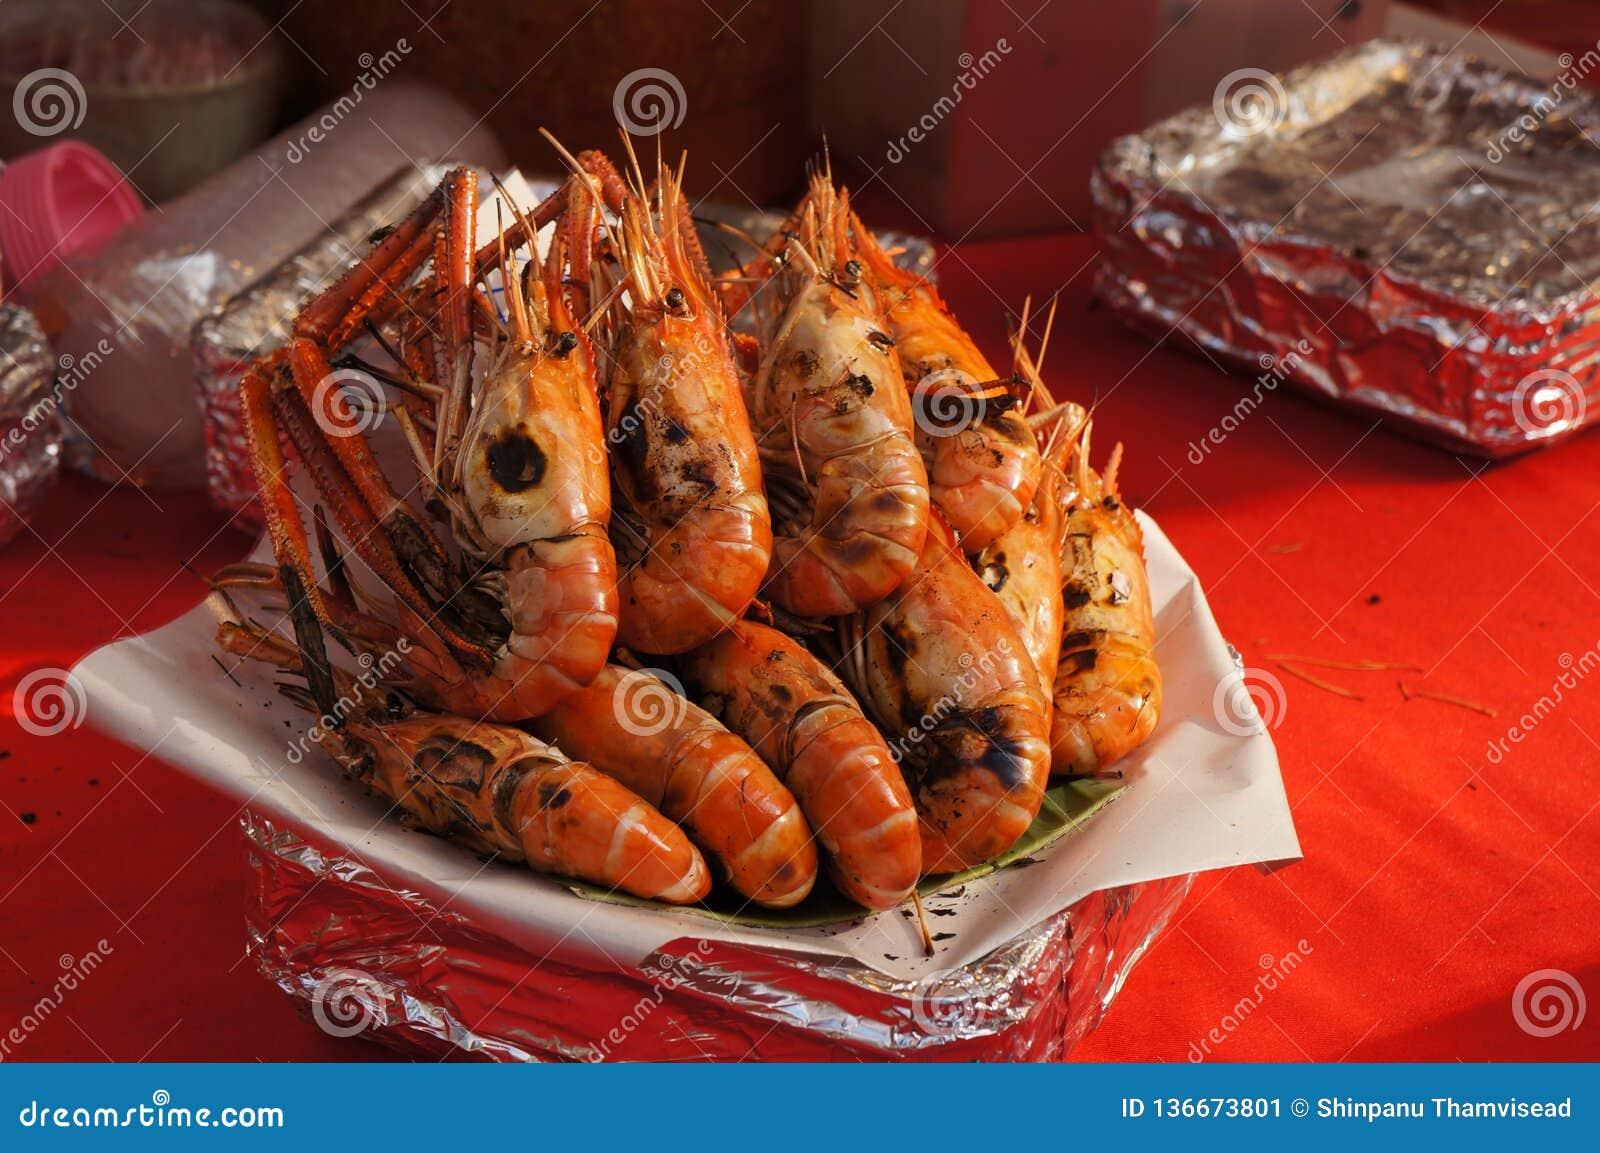 Shrimp Burnt In The Aluminium Foil Tray, Street Food In Thailand